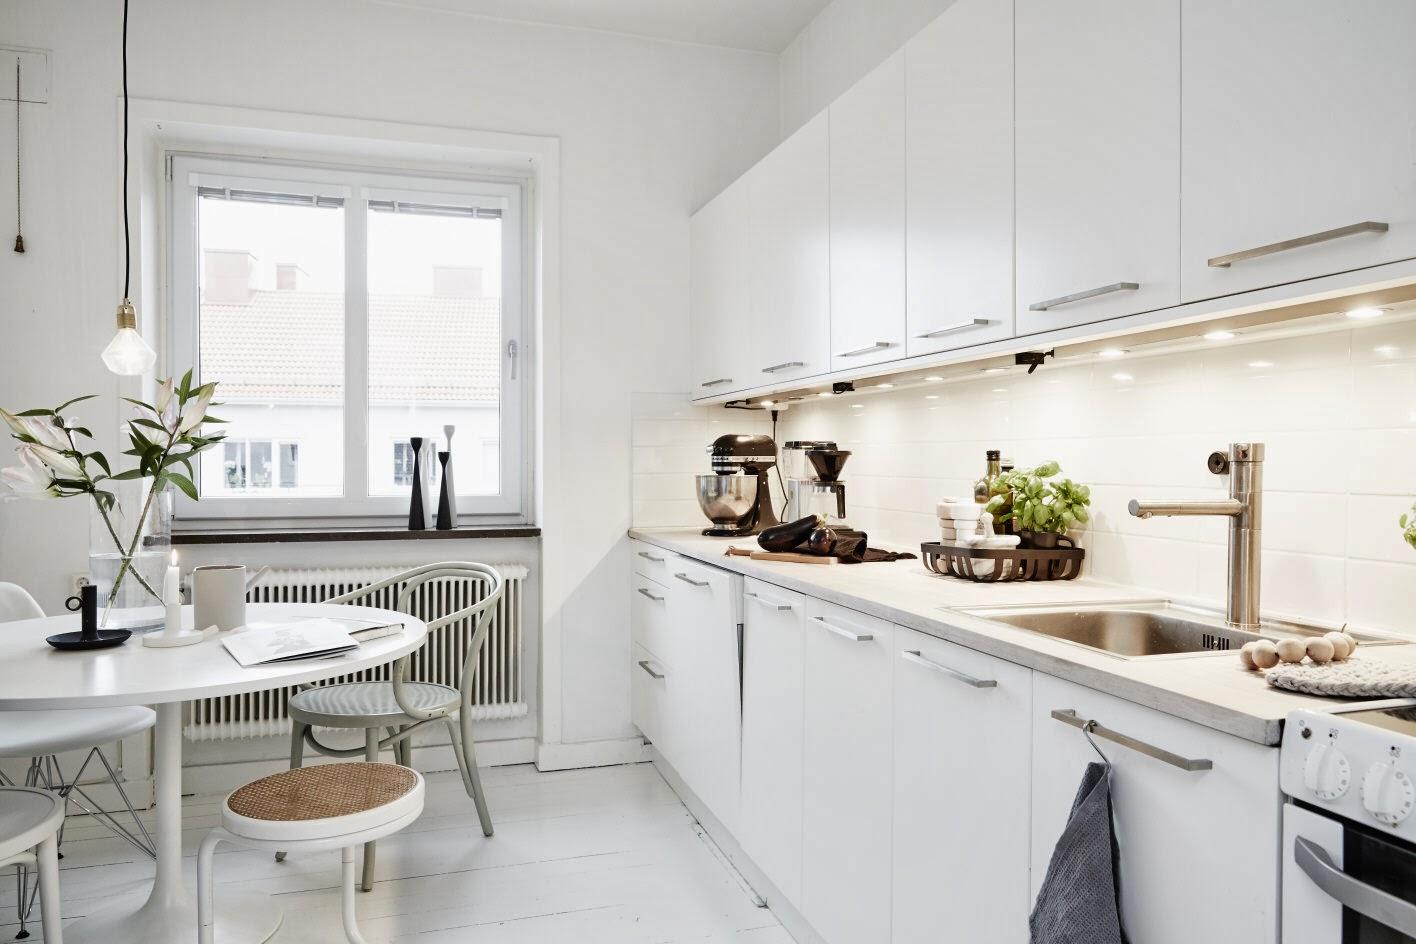 Best Kitchen Gallery: My Scandinavian Home The Beautiful Apartment Of A Swedish Interior of Swedish Home Design  on rachelxblog.com